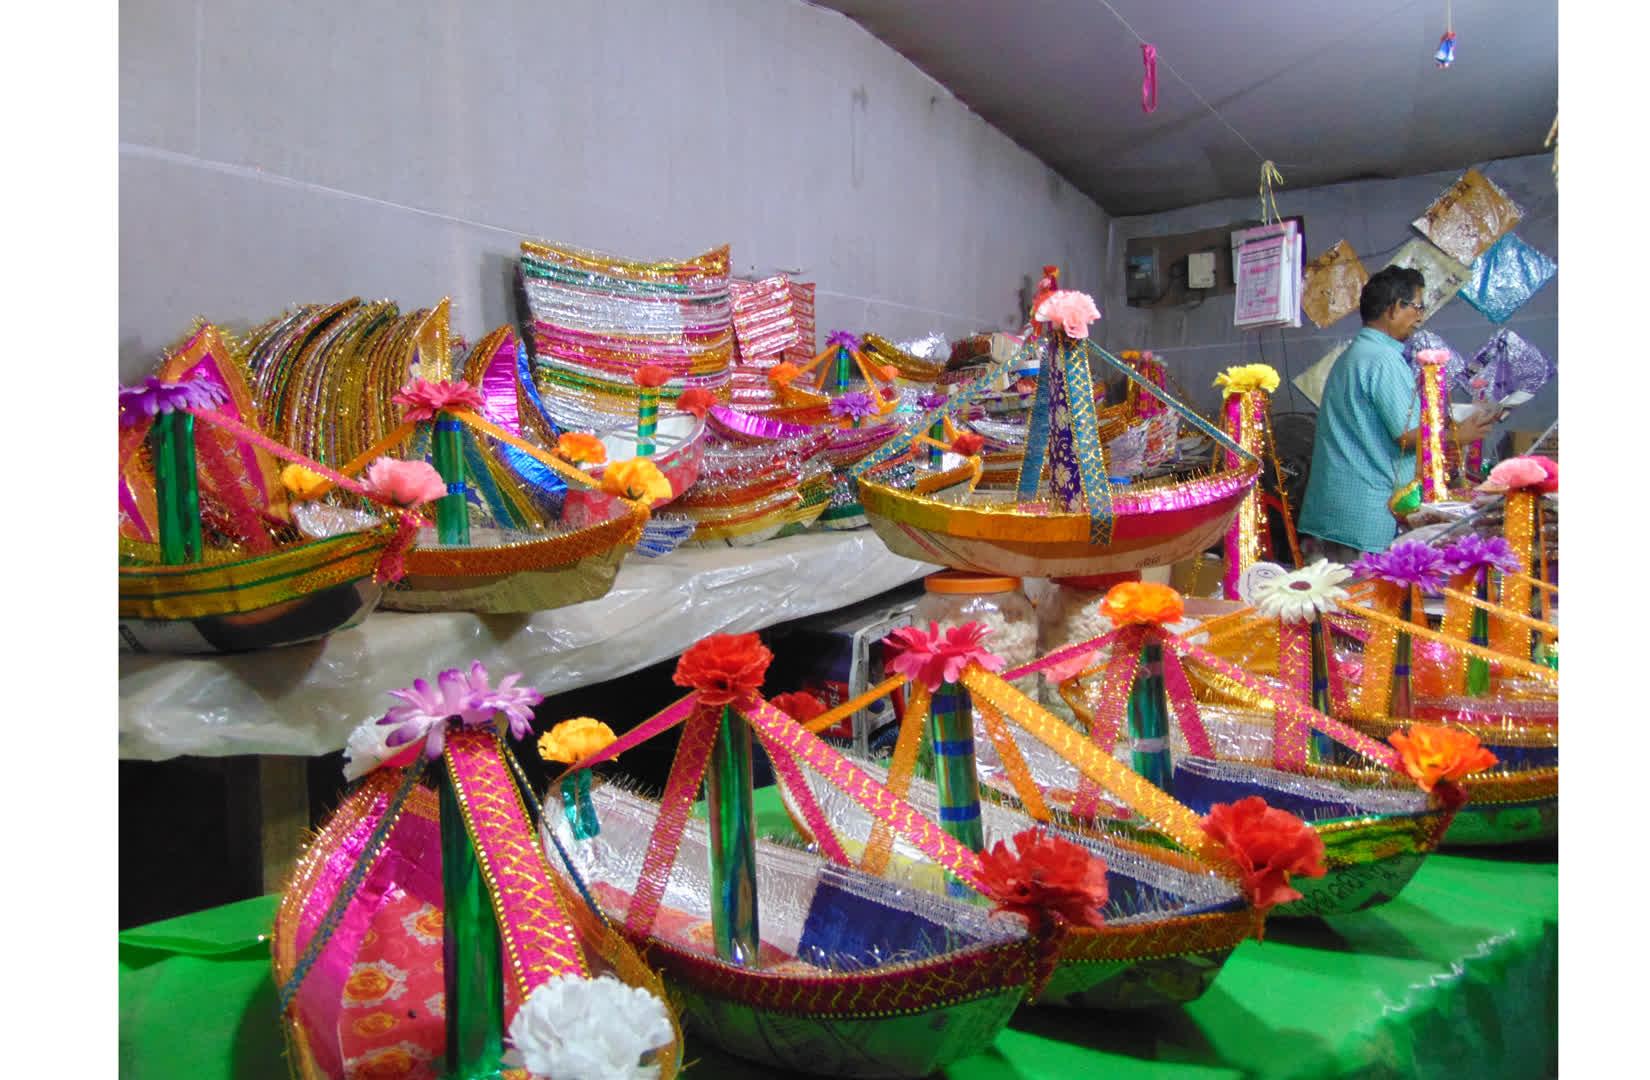 Shop selling paper boats in Bhubaneswar